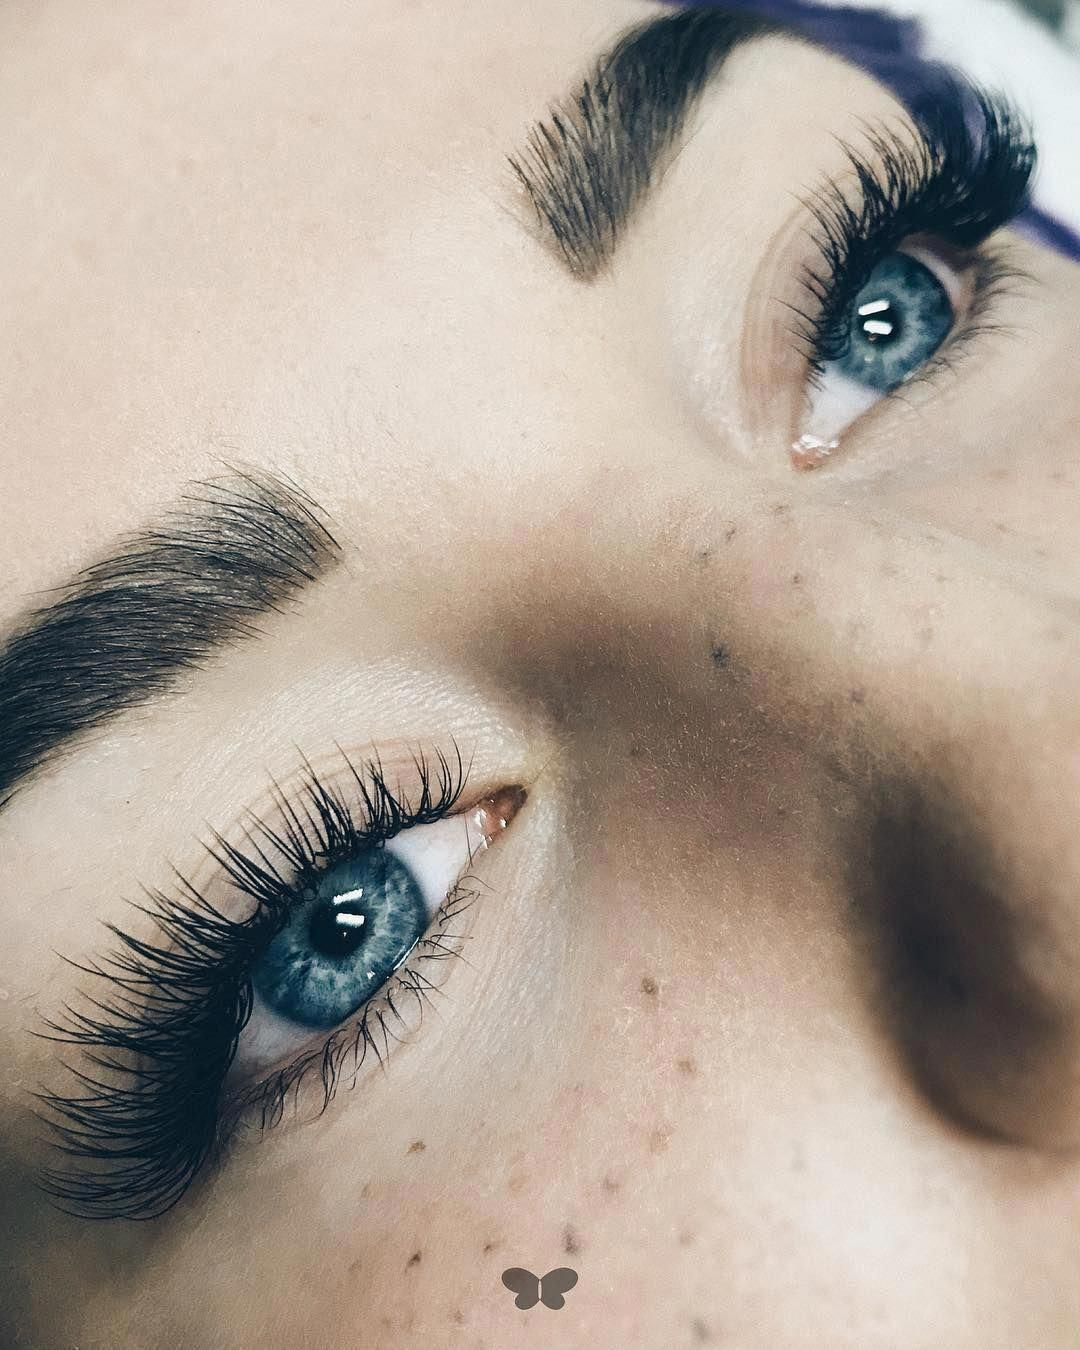 Eyelash Salon   Fake Eyelash Brands   How To Get Longer ...